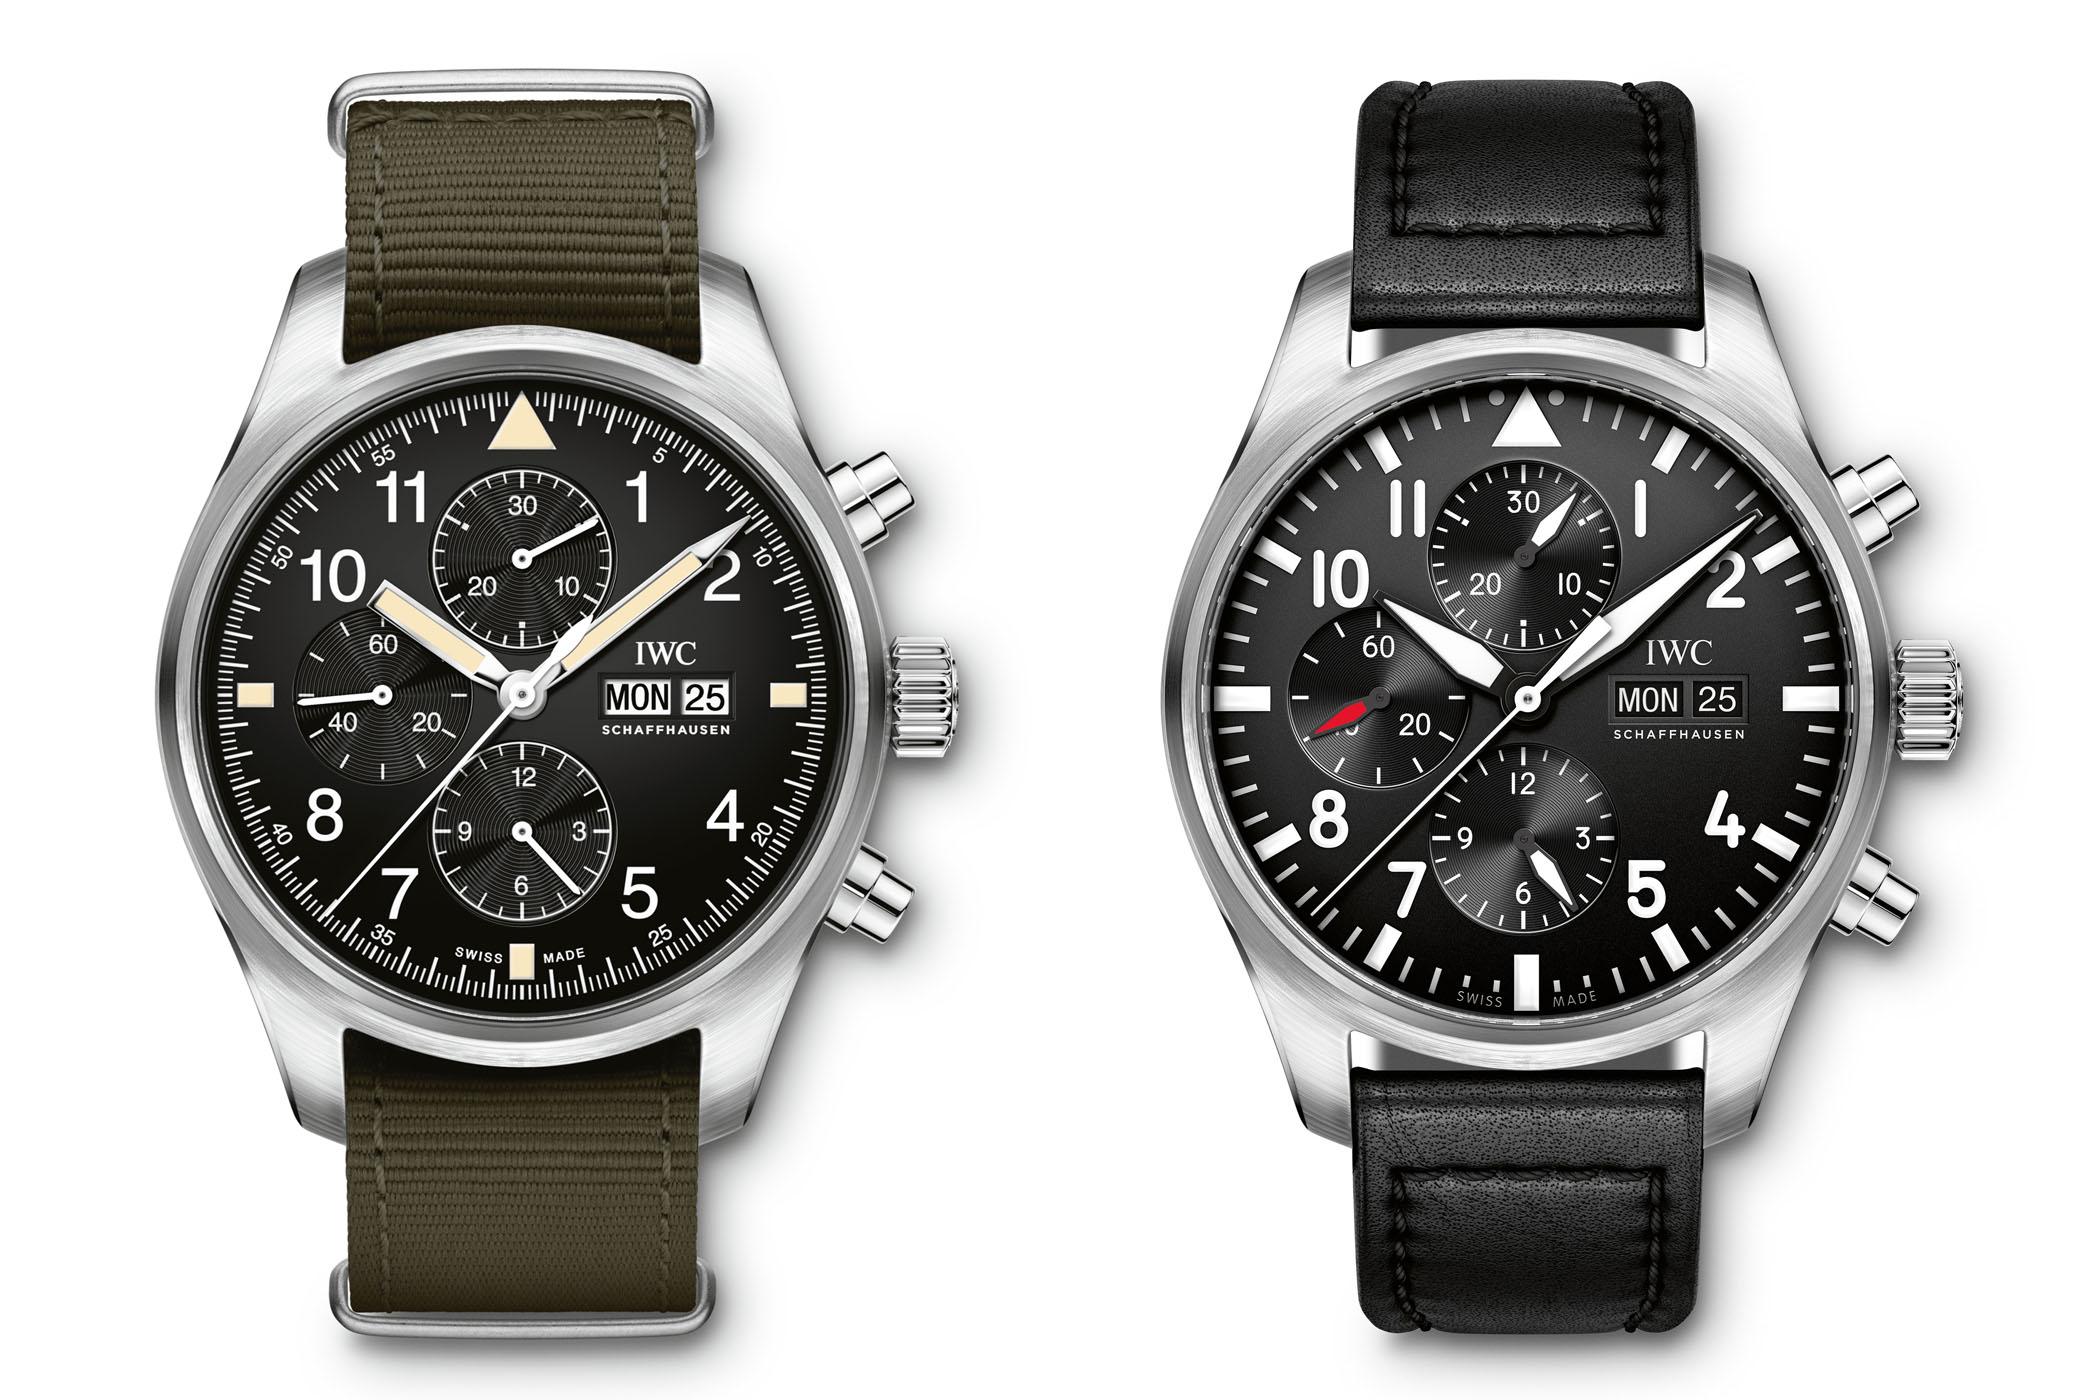 IWC Pilots Watch Chronograph IW377724 vs IW377709